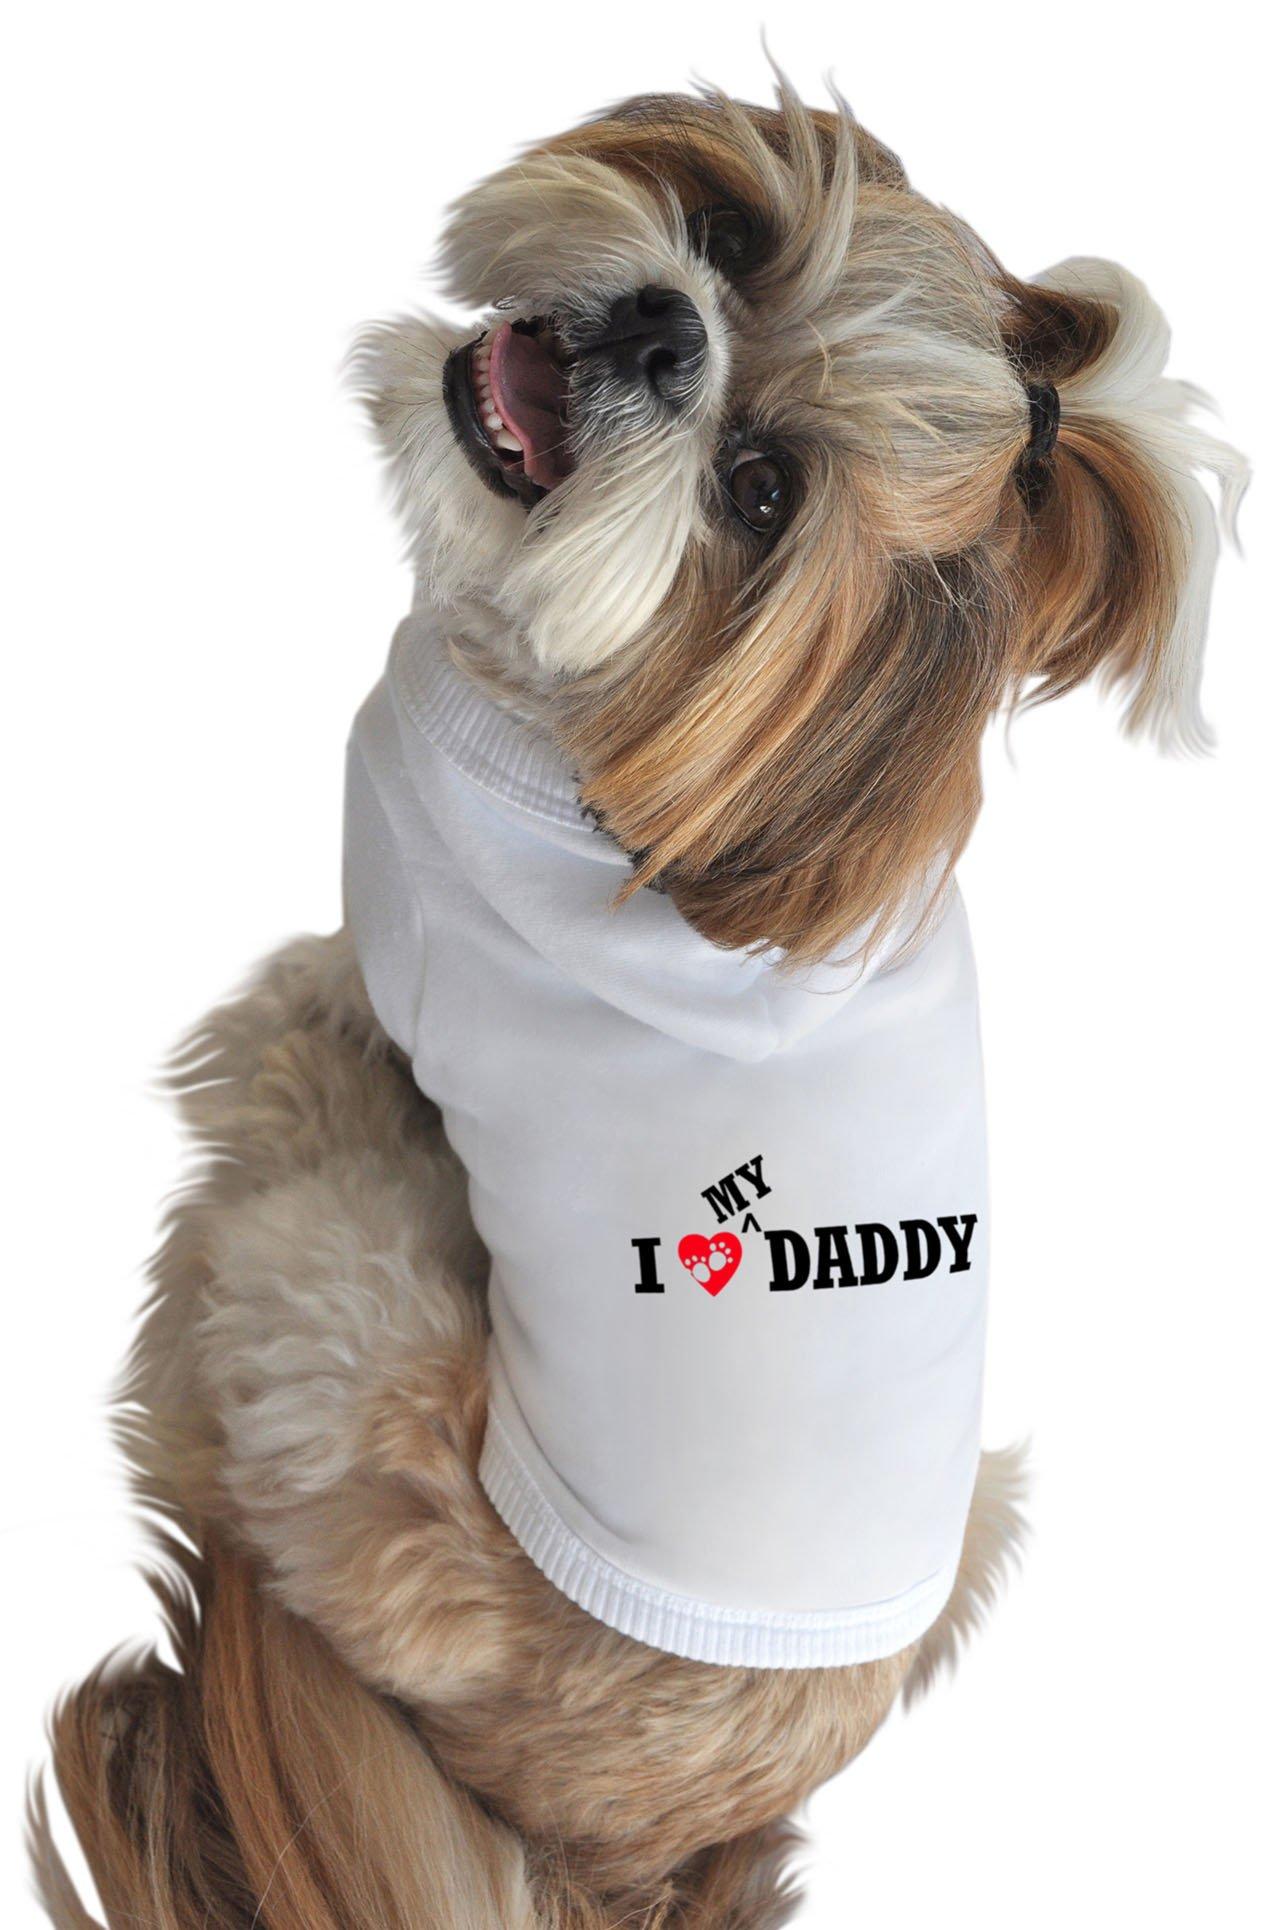 Ruff Ruff and Meow Dog Hoodie, I Love My Daddy, White, Medium by Ruff Ruff and Meow (Image #1)